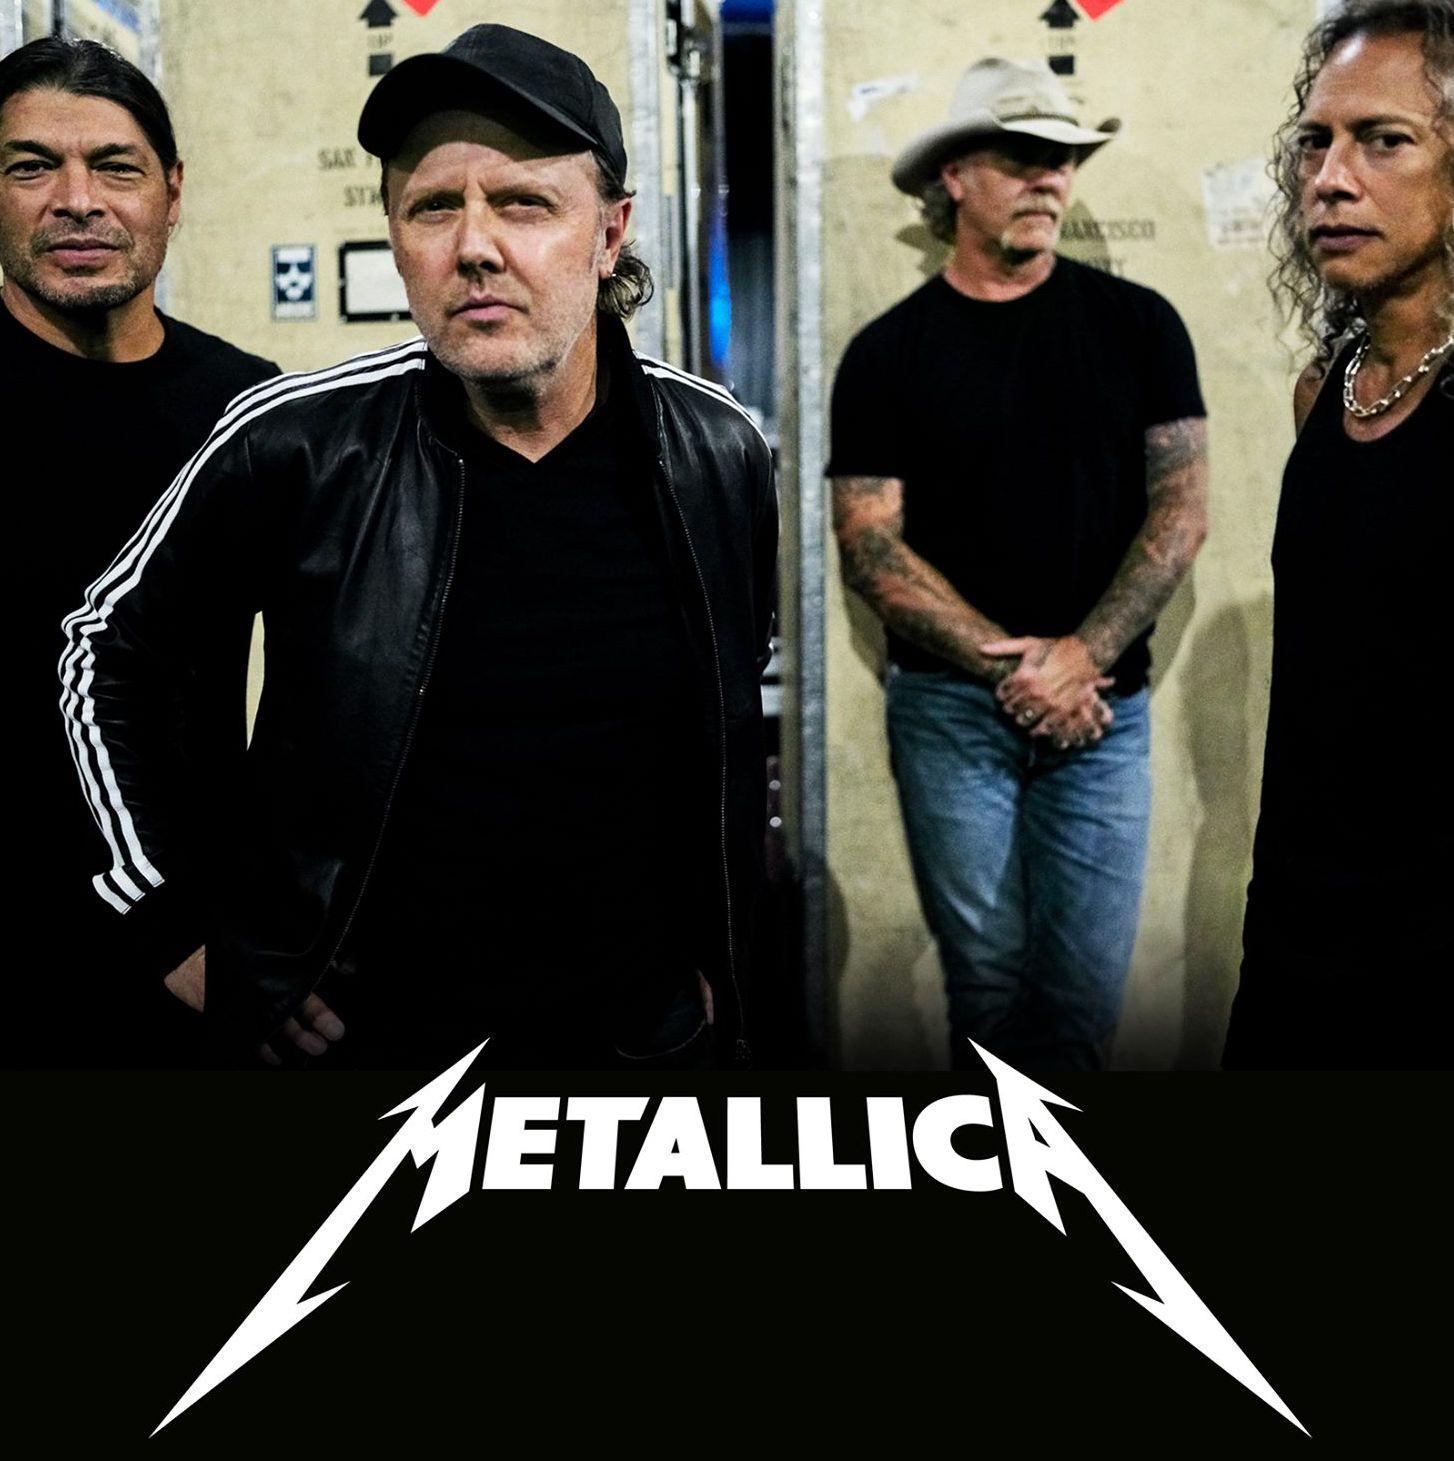 Metallica a Firenze Rocks 2022: date, biglietti e come arrivare